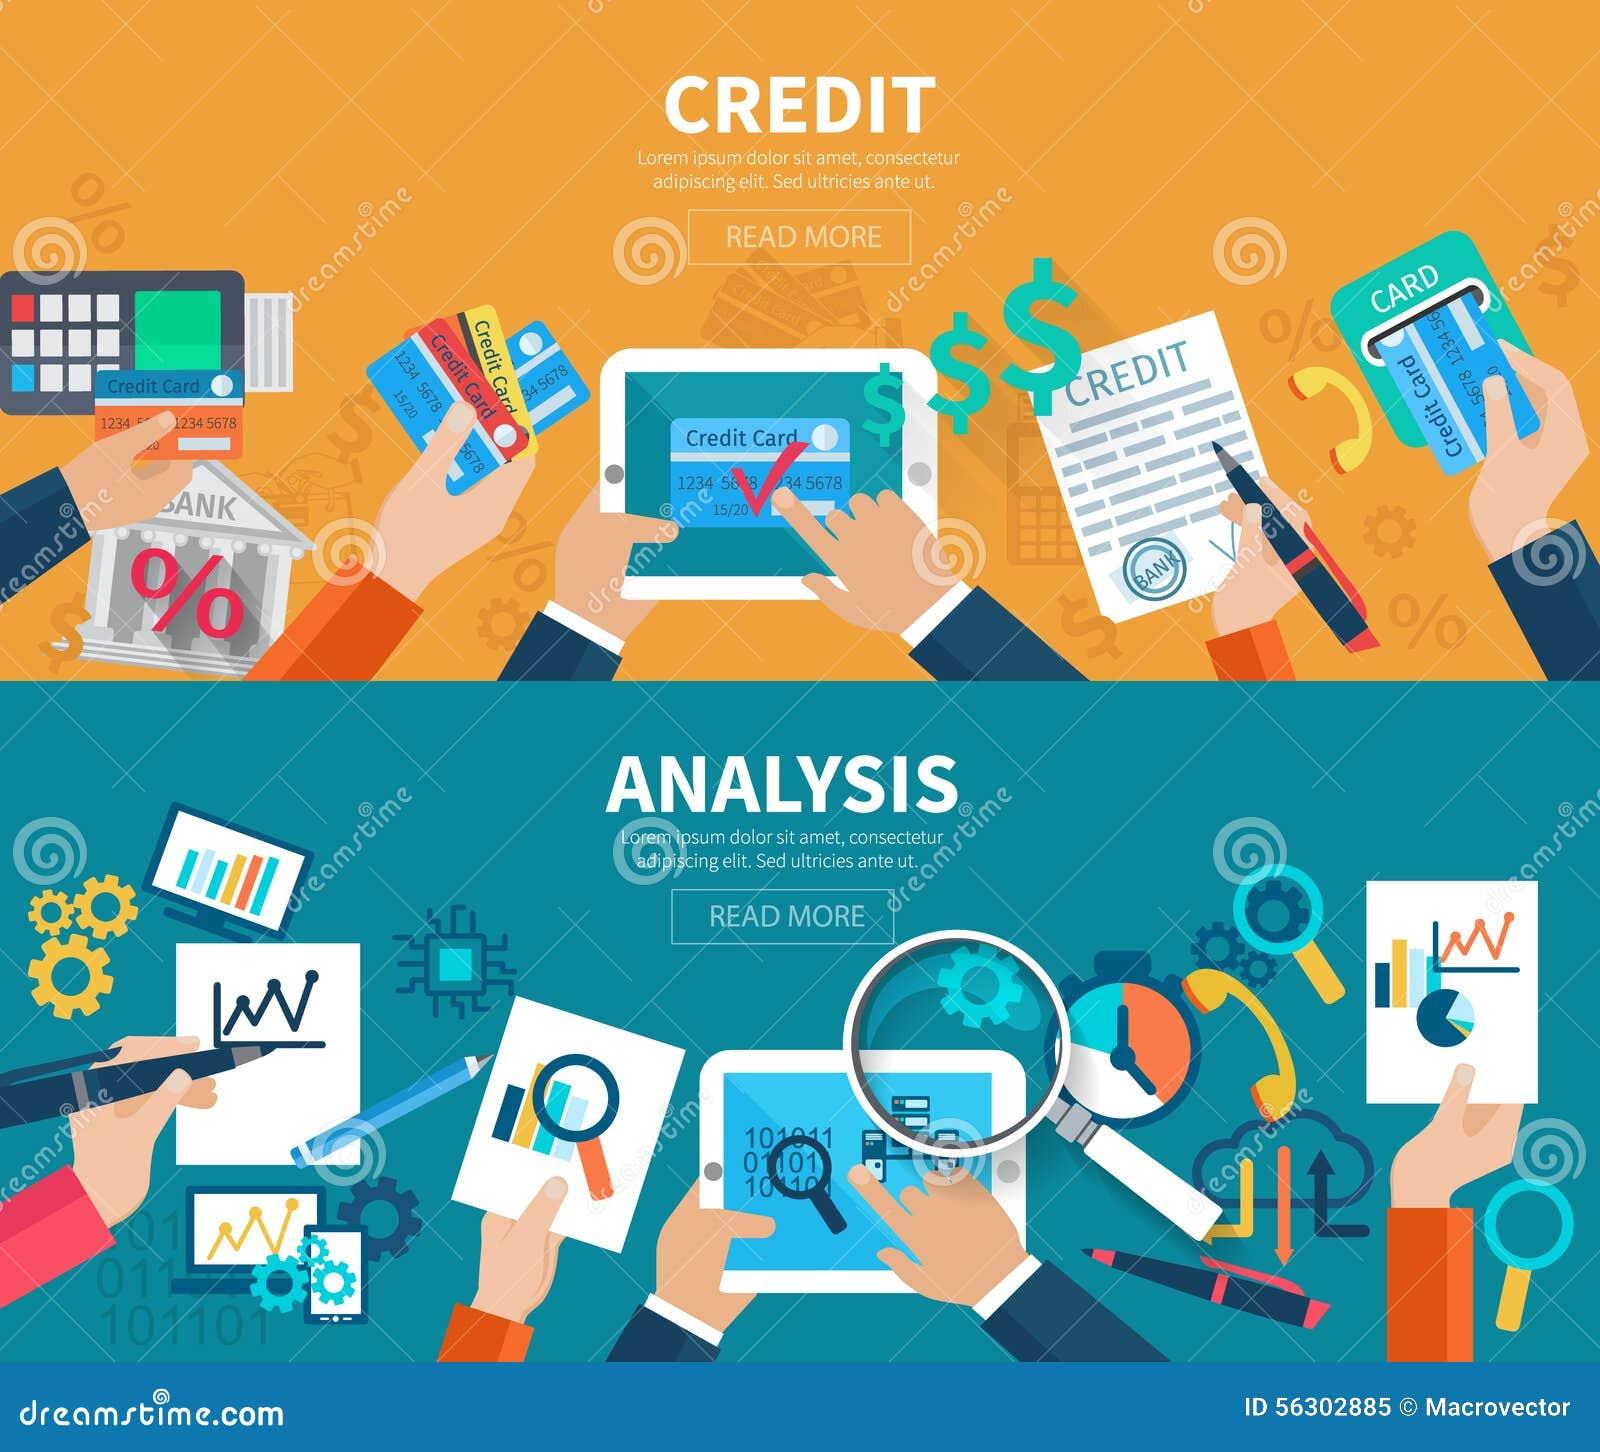 Business Plan: Your Financial Plan